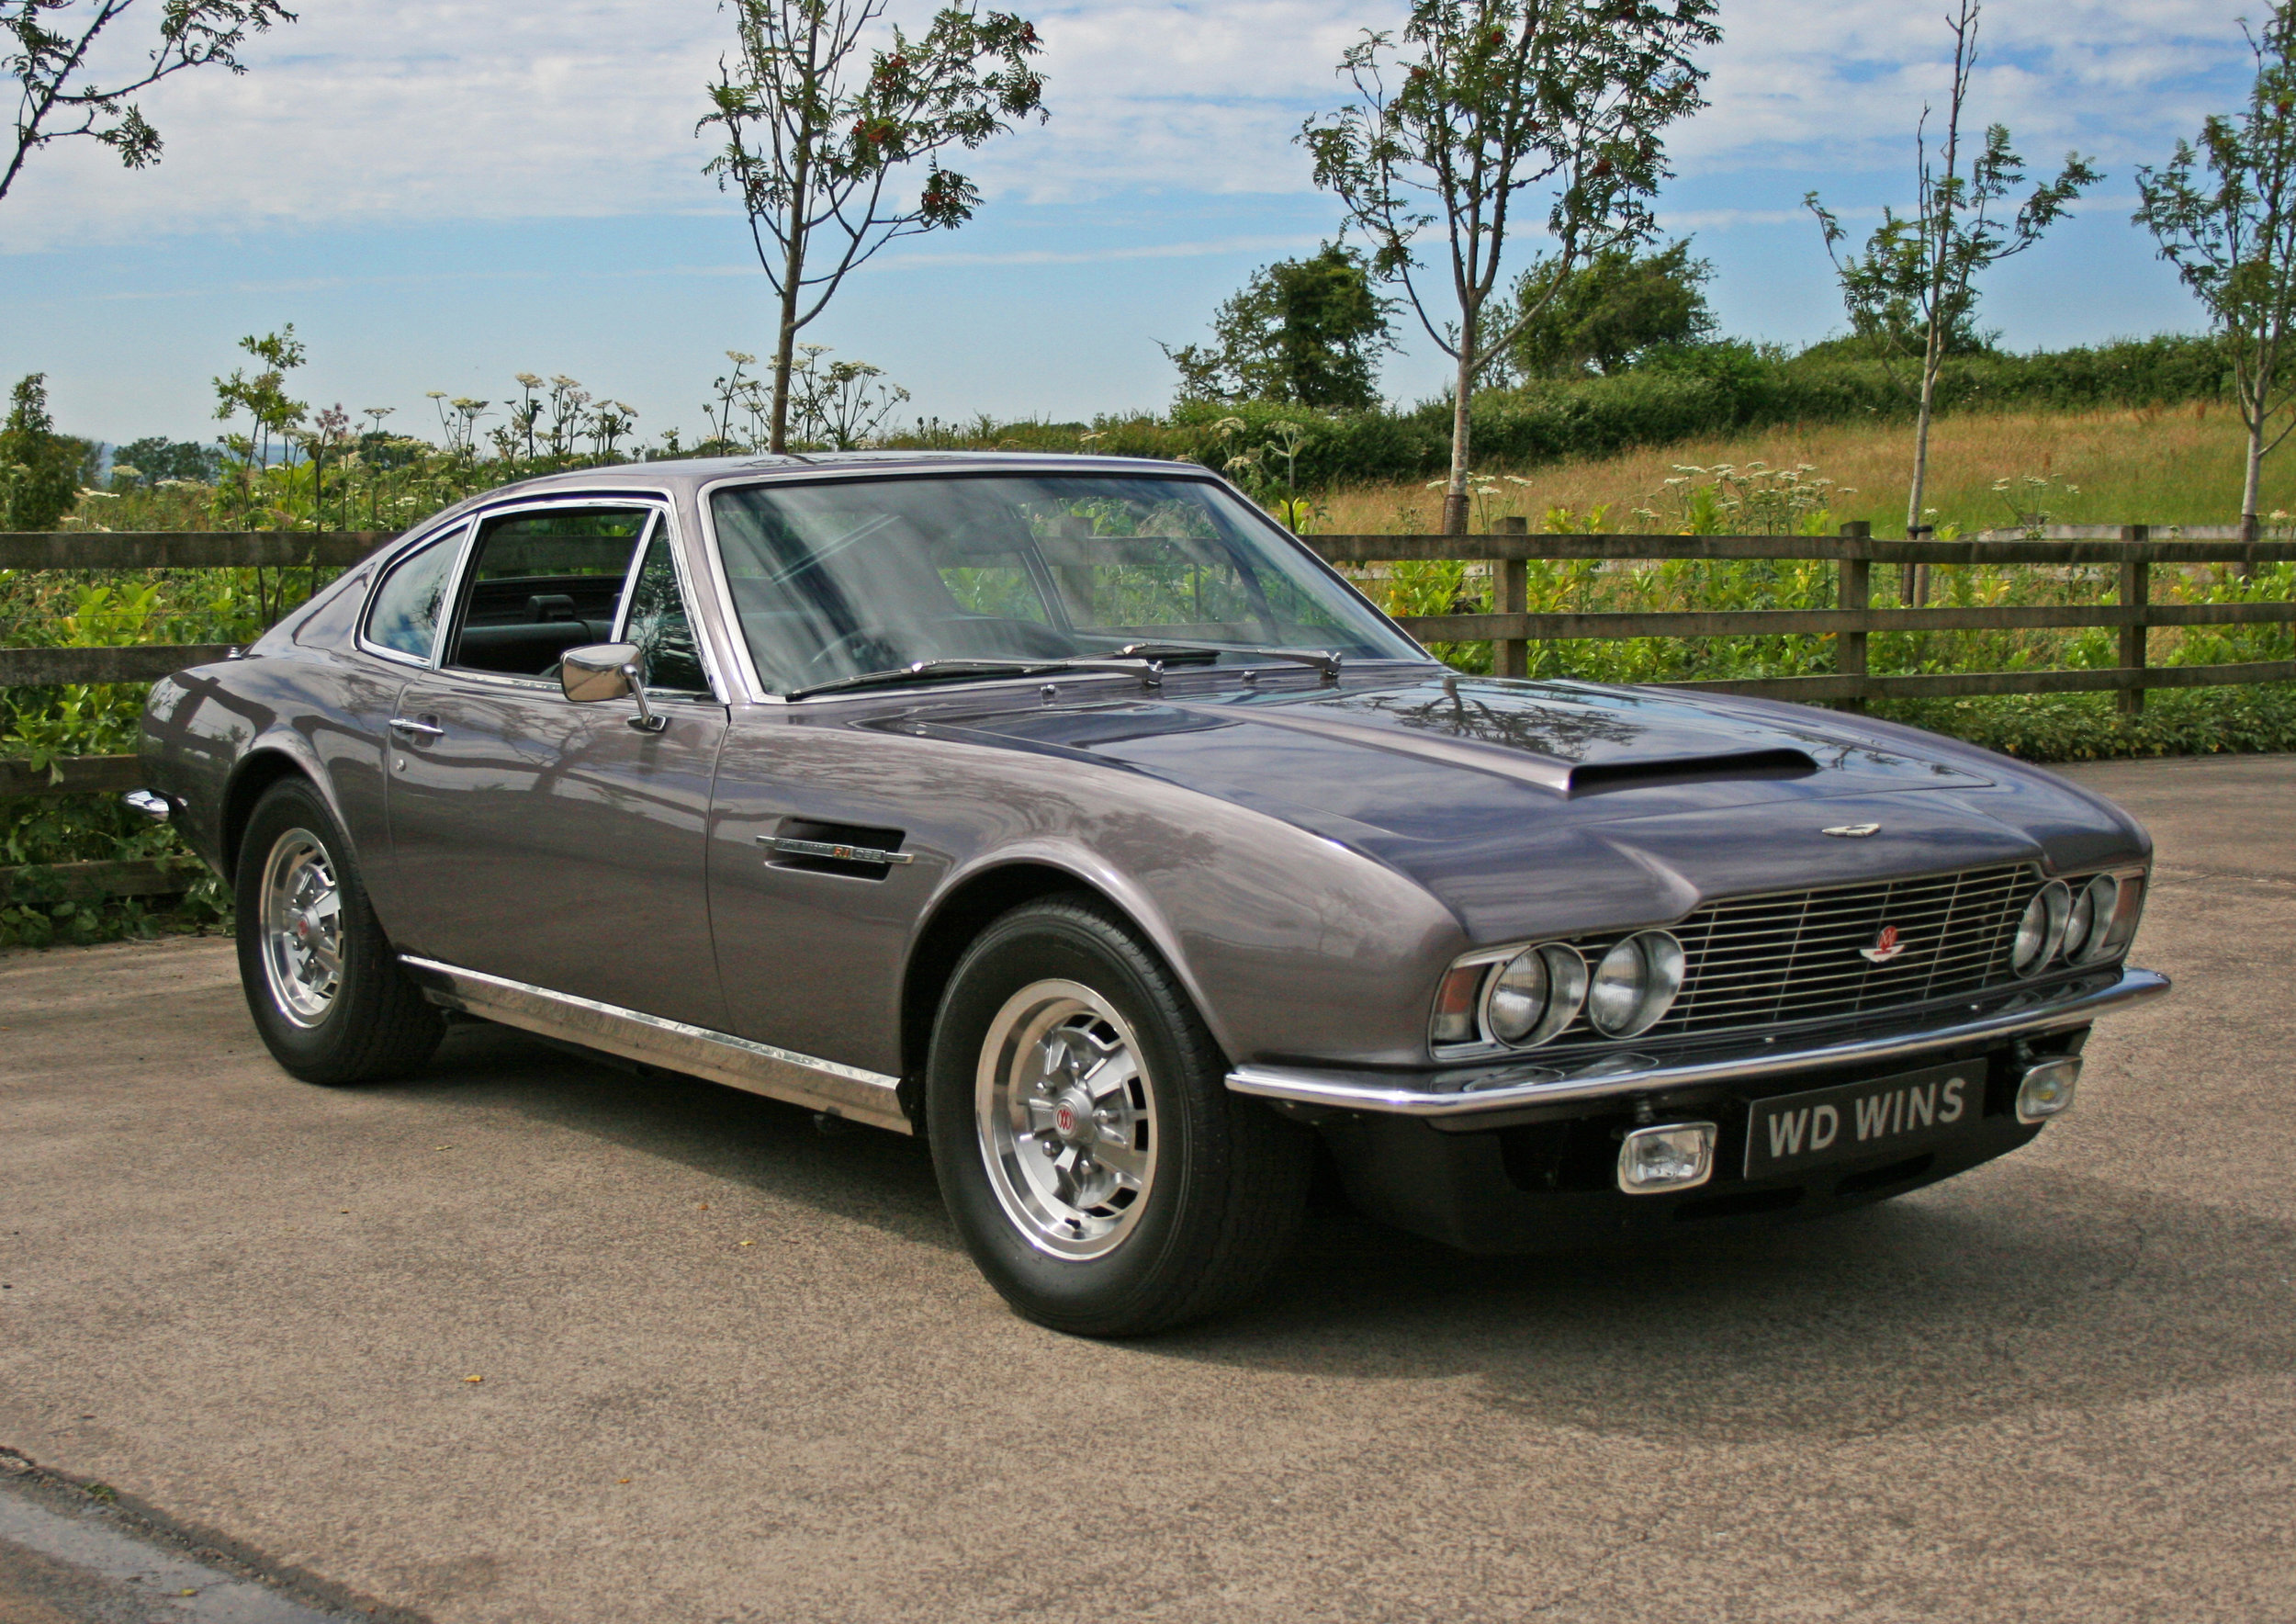 1971 Aston Martin Dbs V8 W D Wins